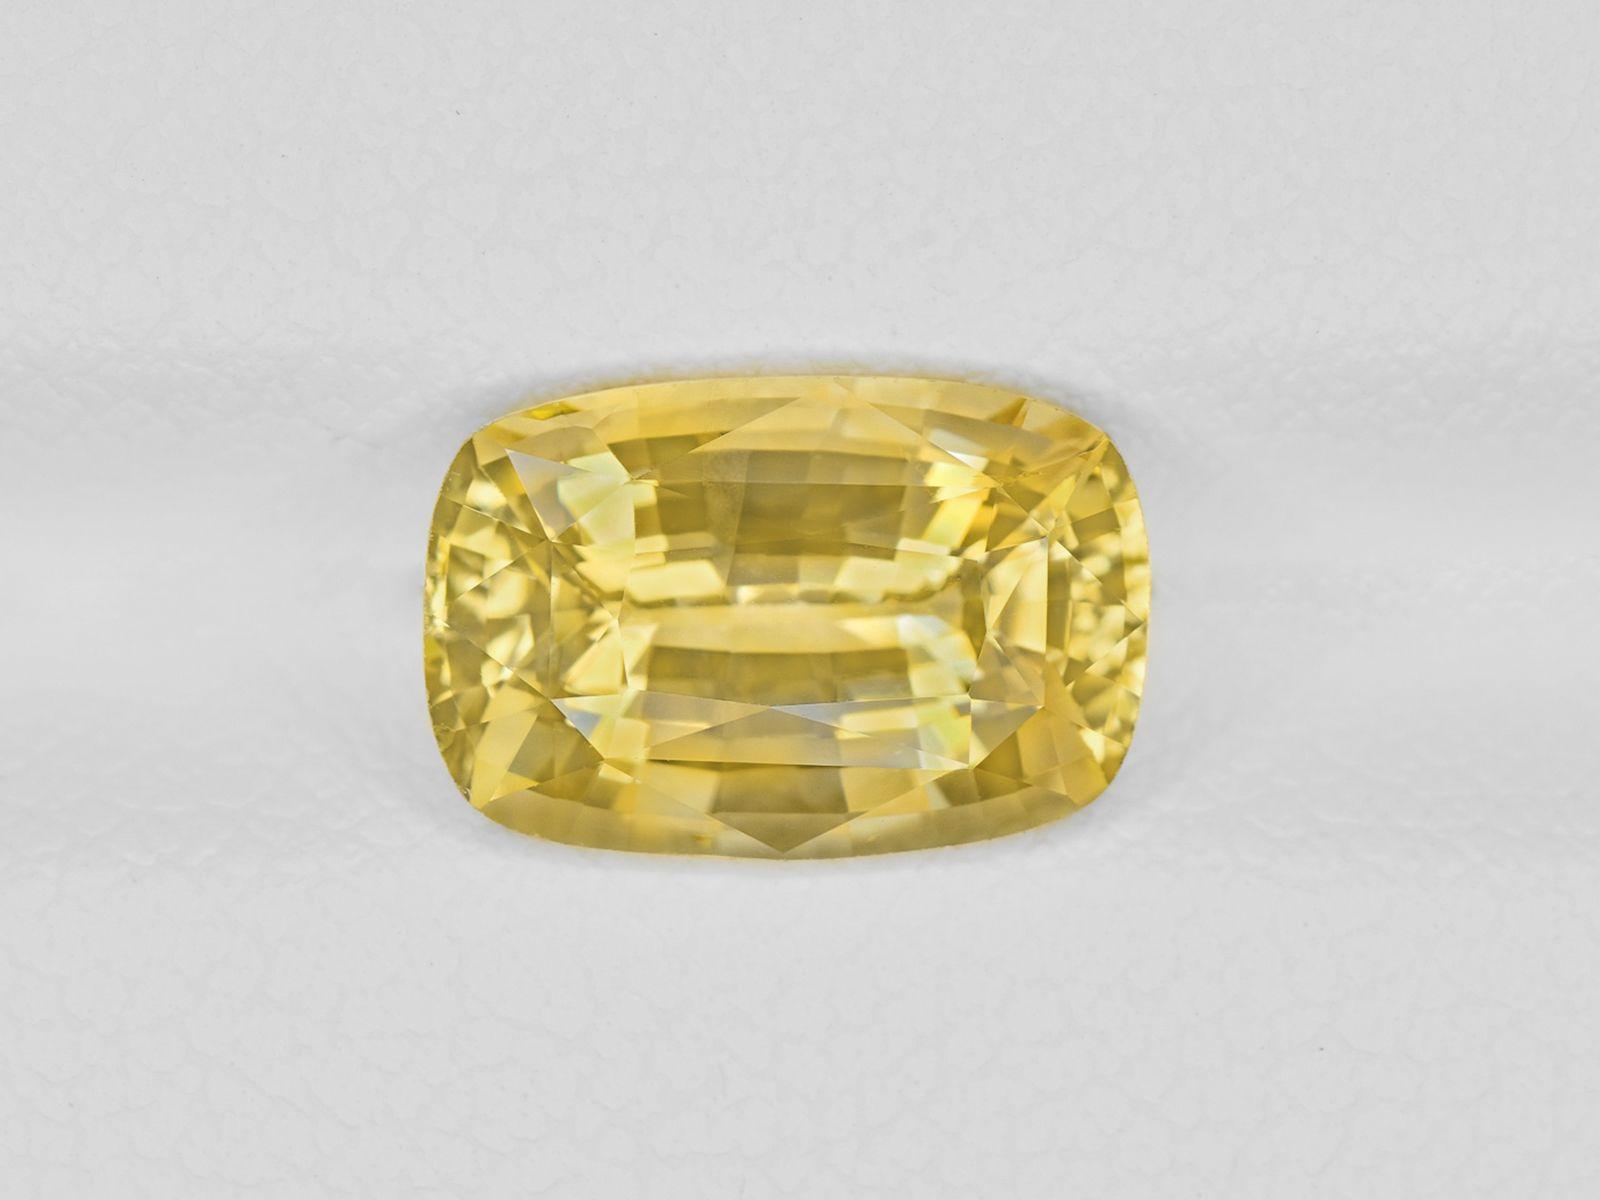 Yellow Sapphire 3 15ct Mined In Sri Lanka Certified By Igi Yellow Sapphire Gemstones Sapphire Stone